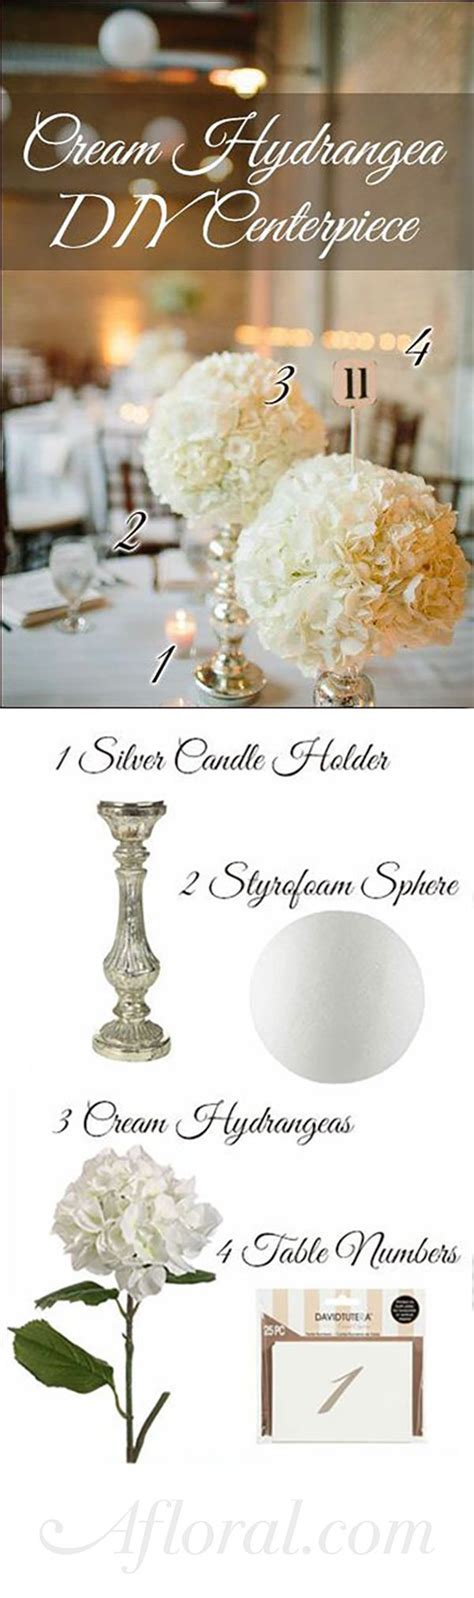 DIY Hydrangea Centerpiece ideas for your wedding reception